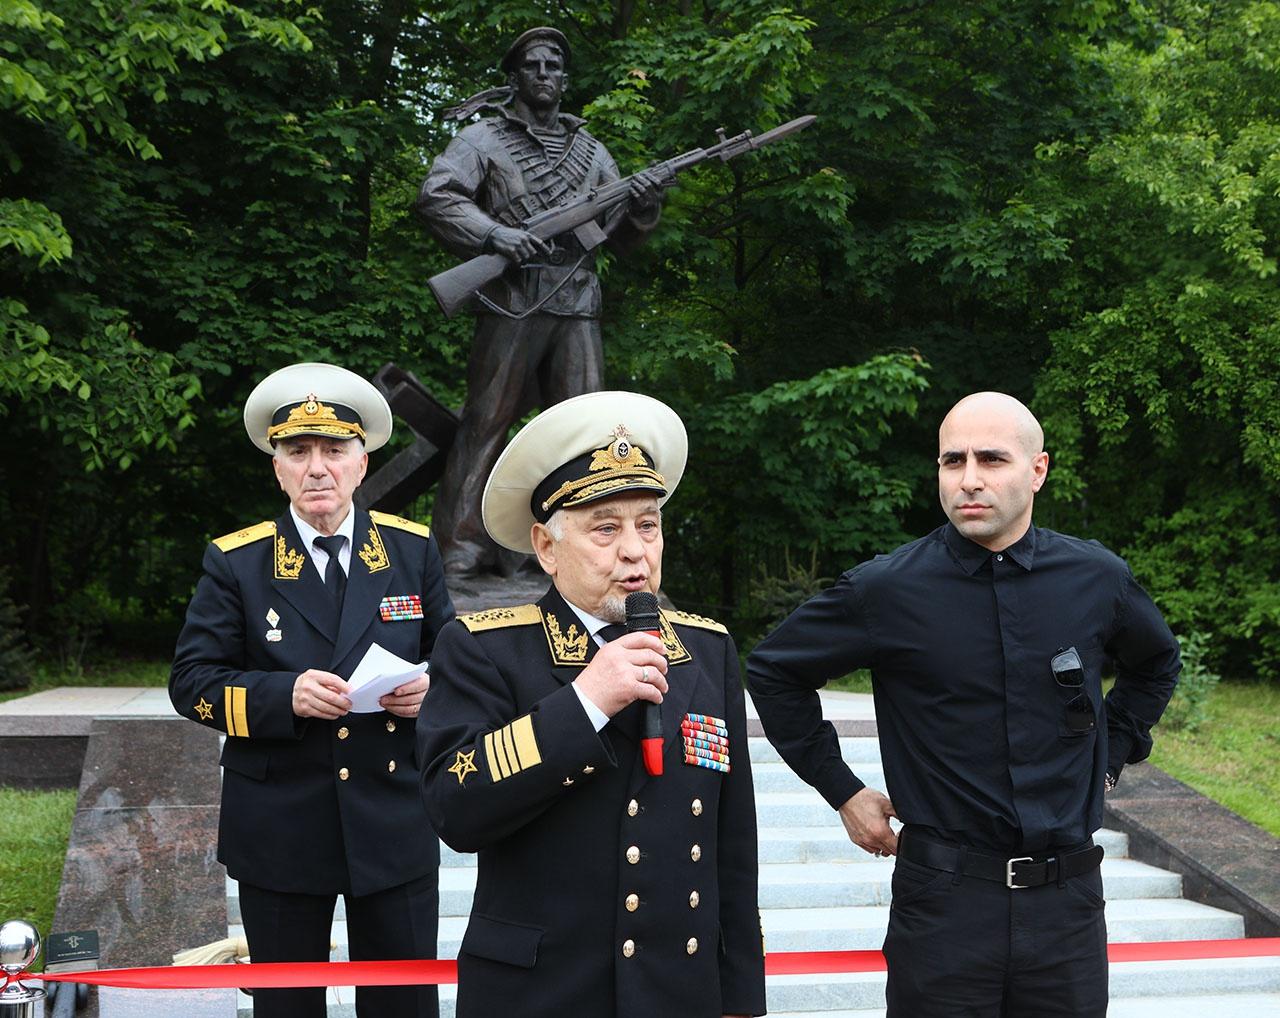 Адмирал Иннокентий Налётов и скульптор Грант Гарибян на открытии памятника.